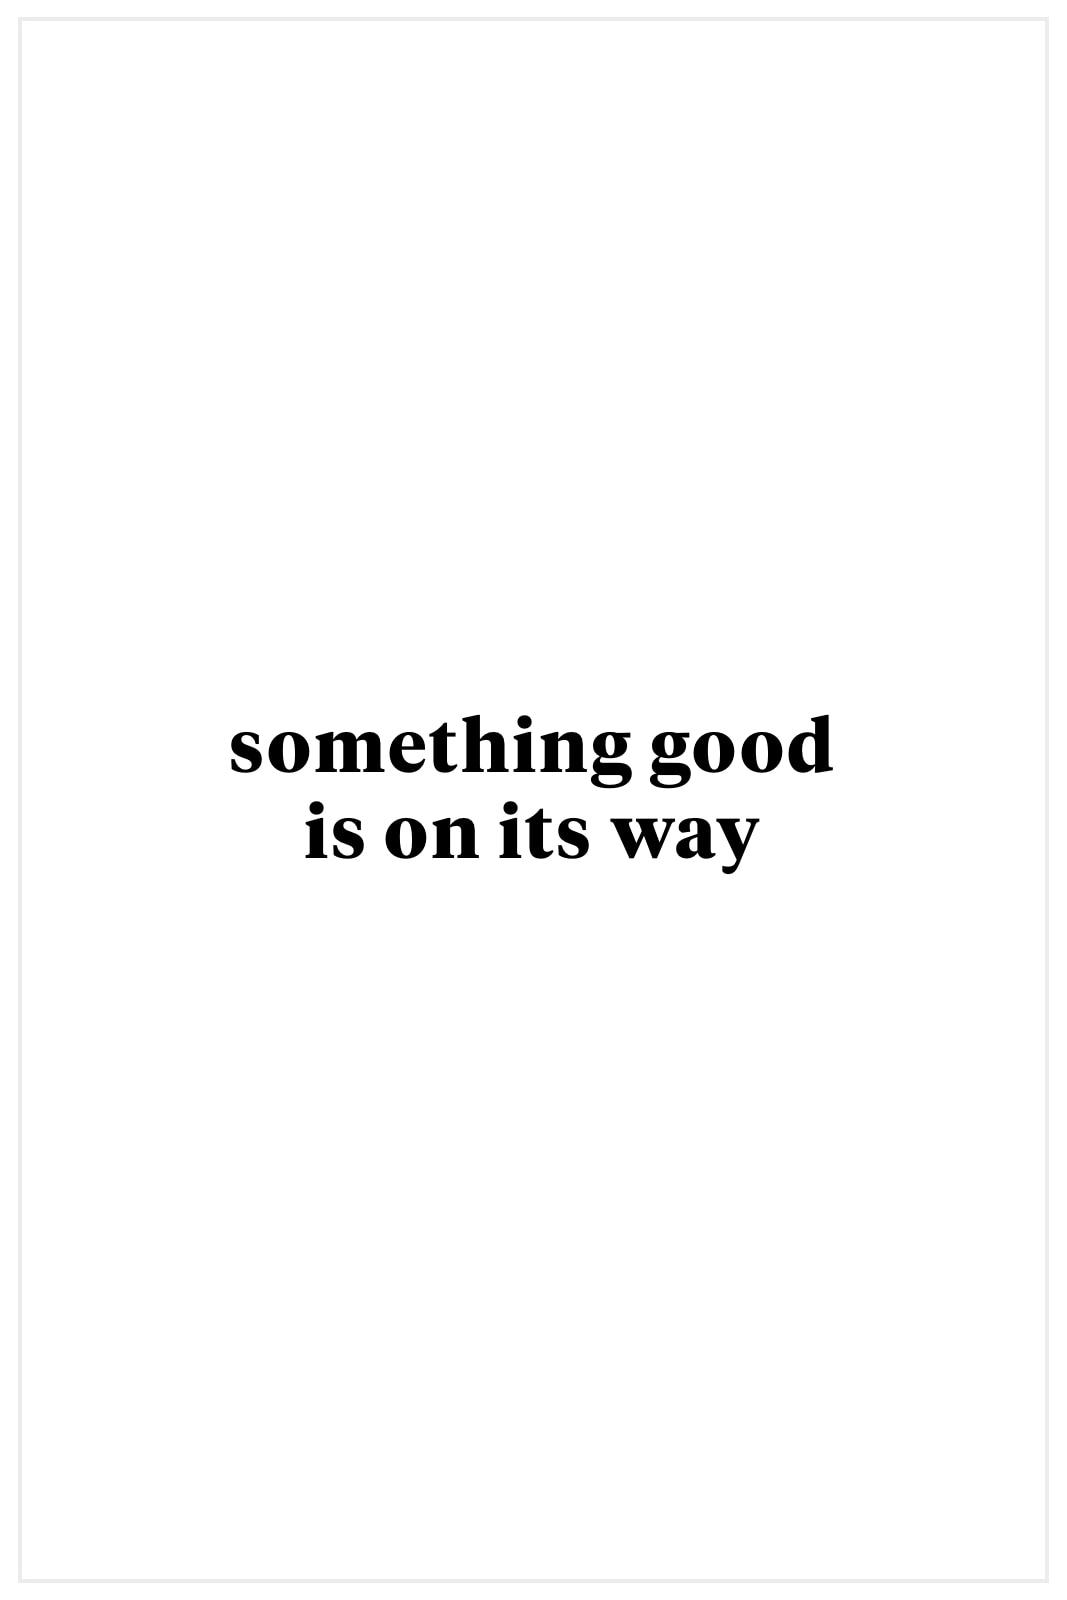 Cheers to the Weekend Tee